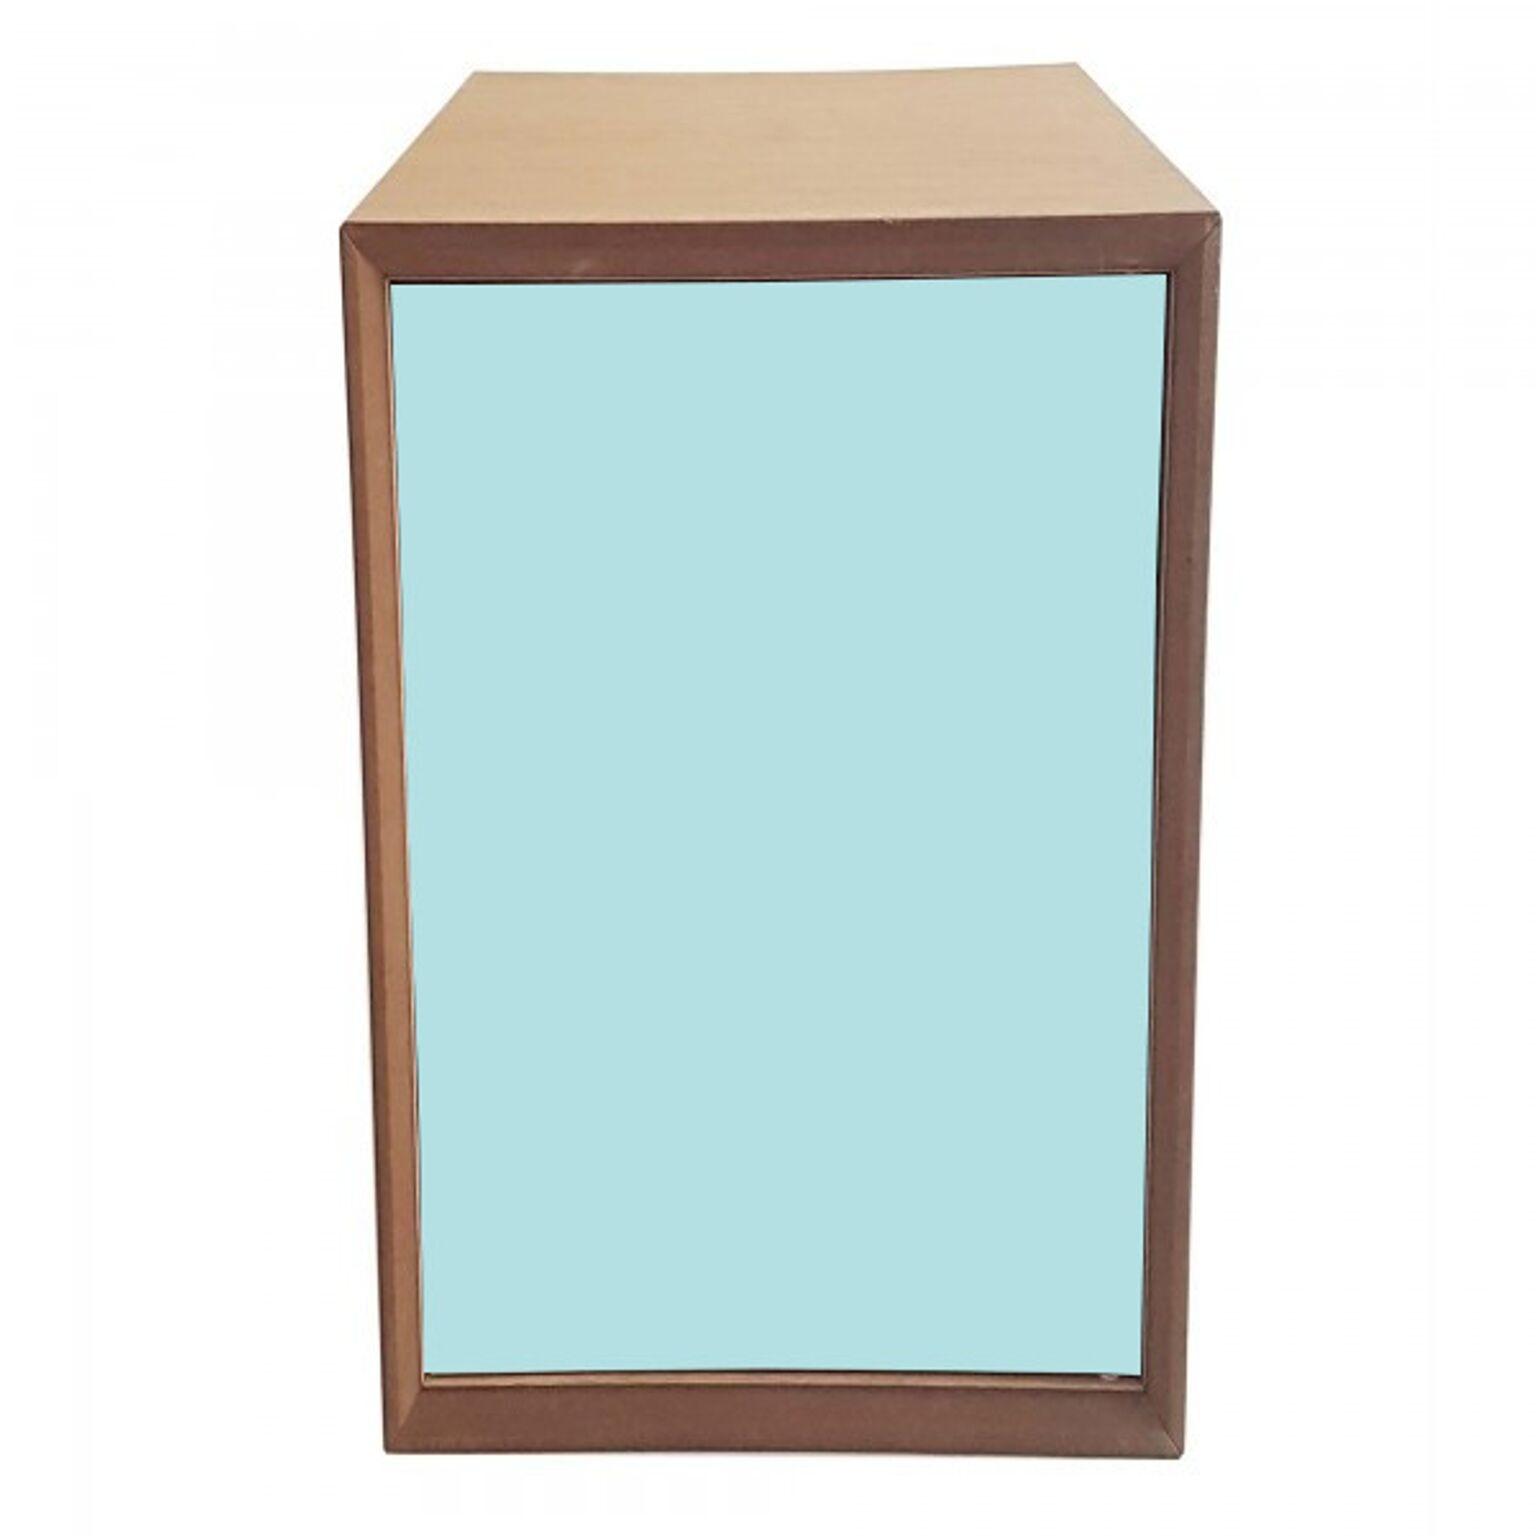 Dulap modular Pixel Light Turquoise / Wooden l40xA40xH80 cm